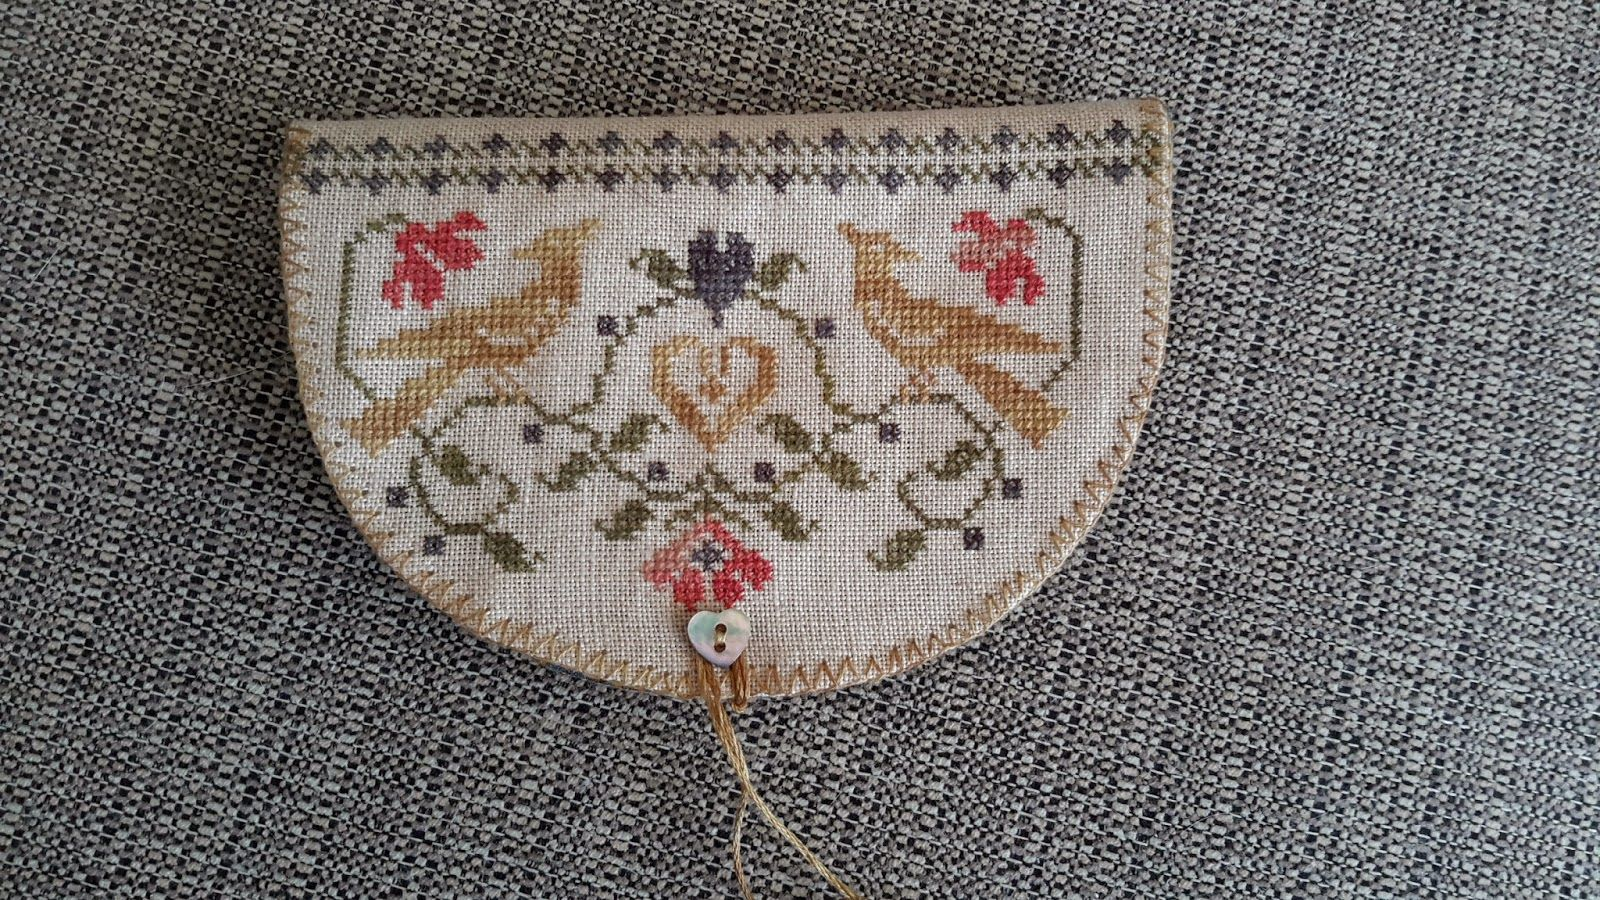 Stitching Squad: Some finishes